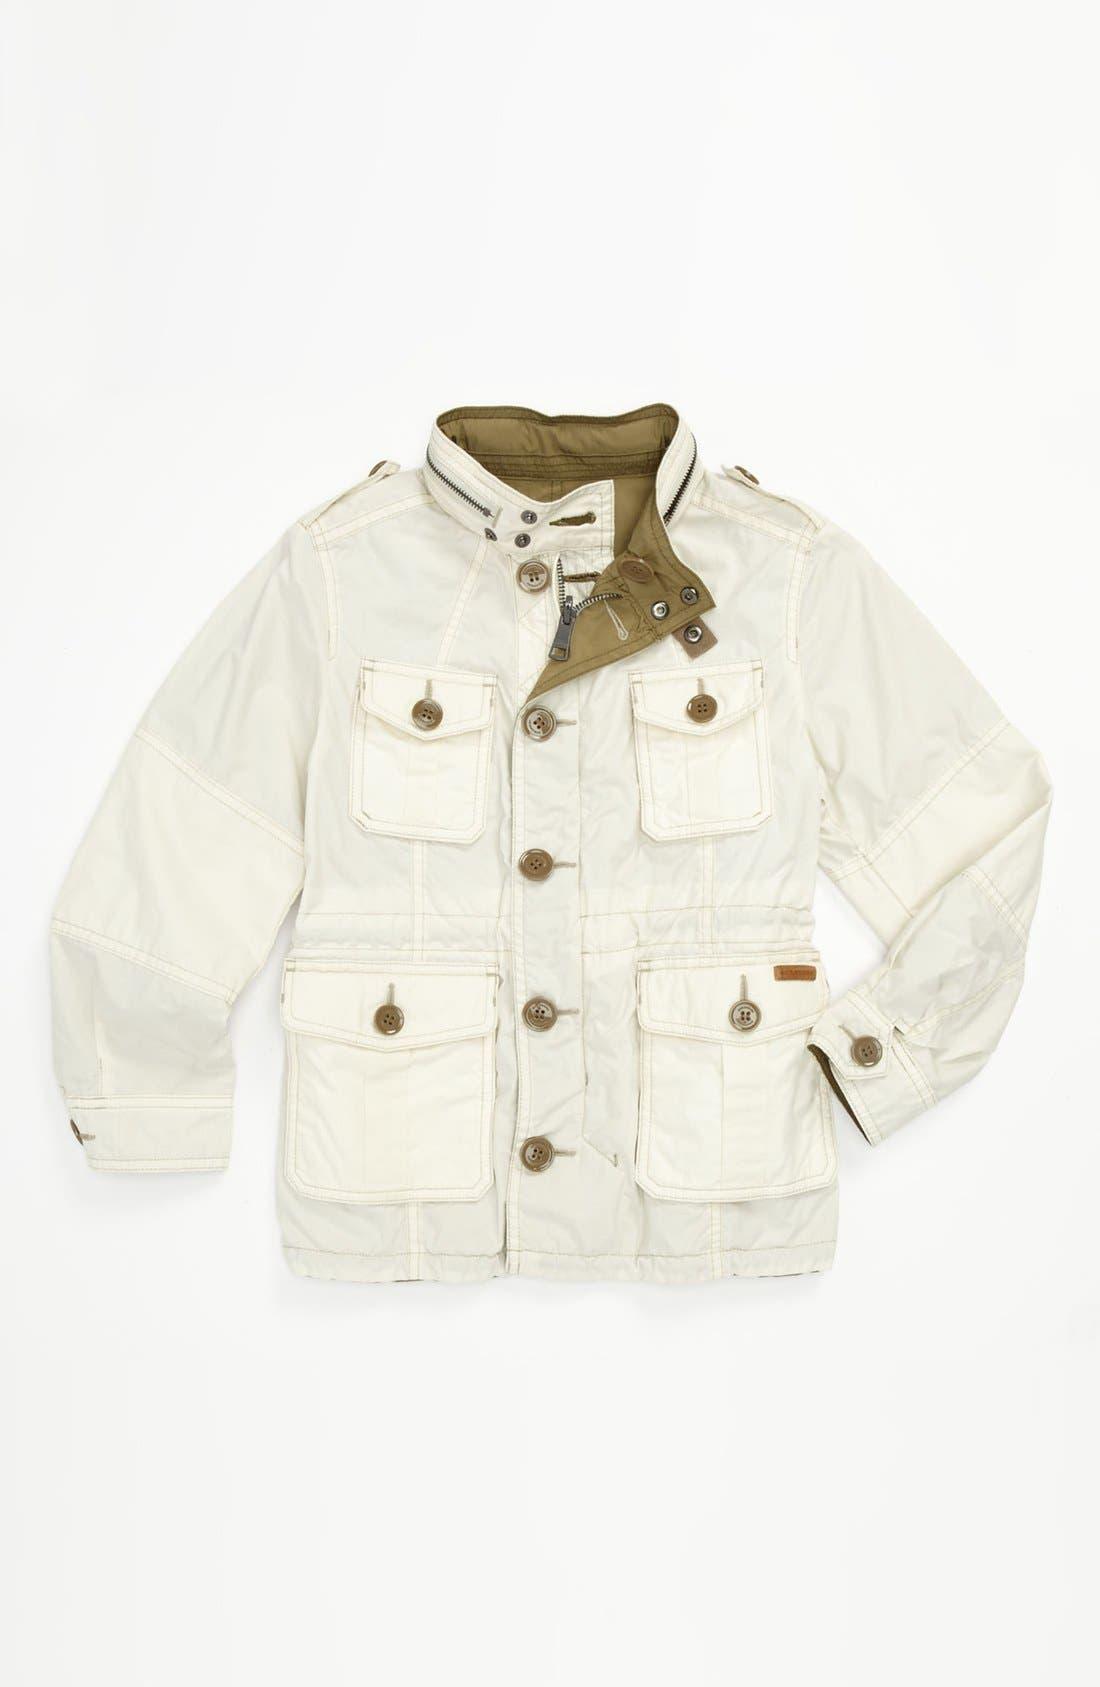 Main Image - Burberry 'Belfont' Reversible Jacket (Little Boys & Big Boys)